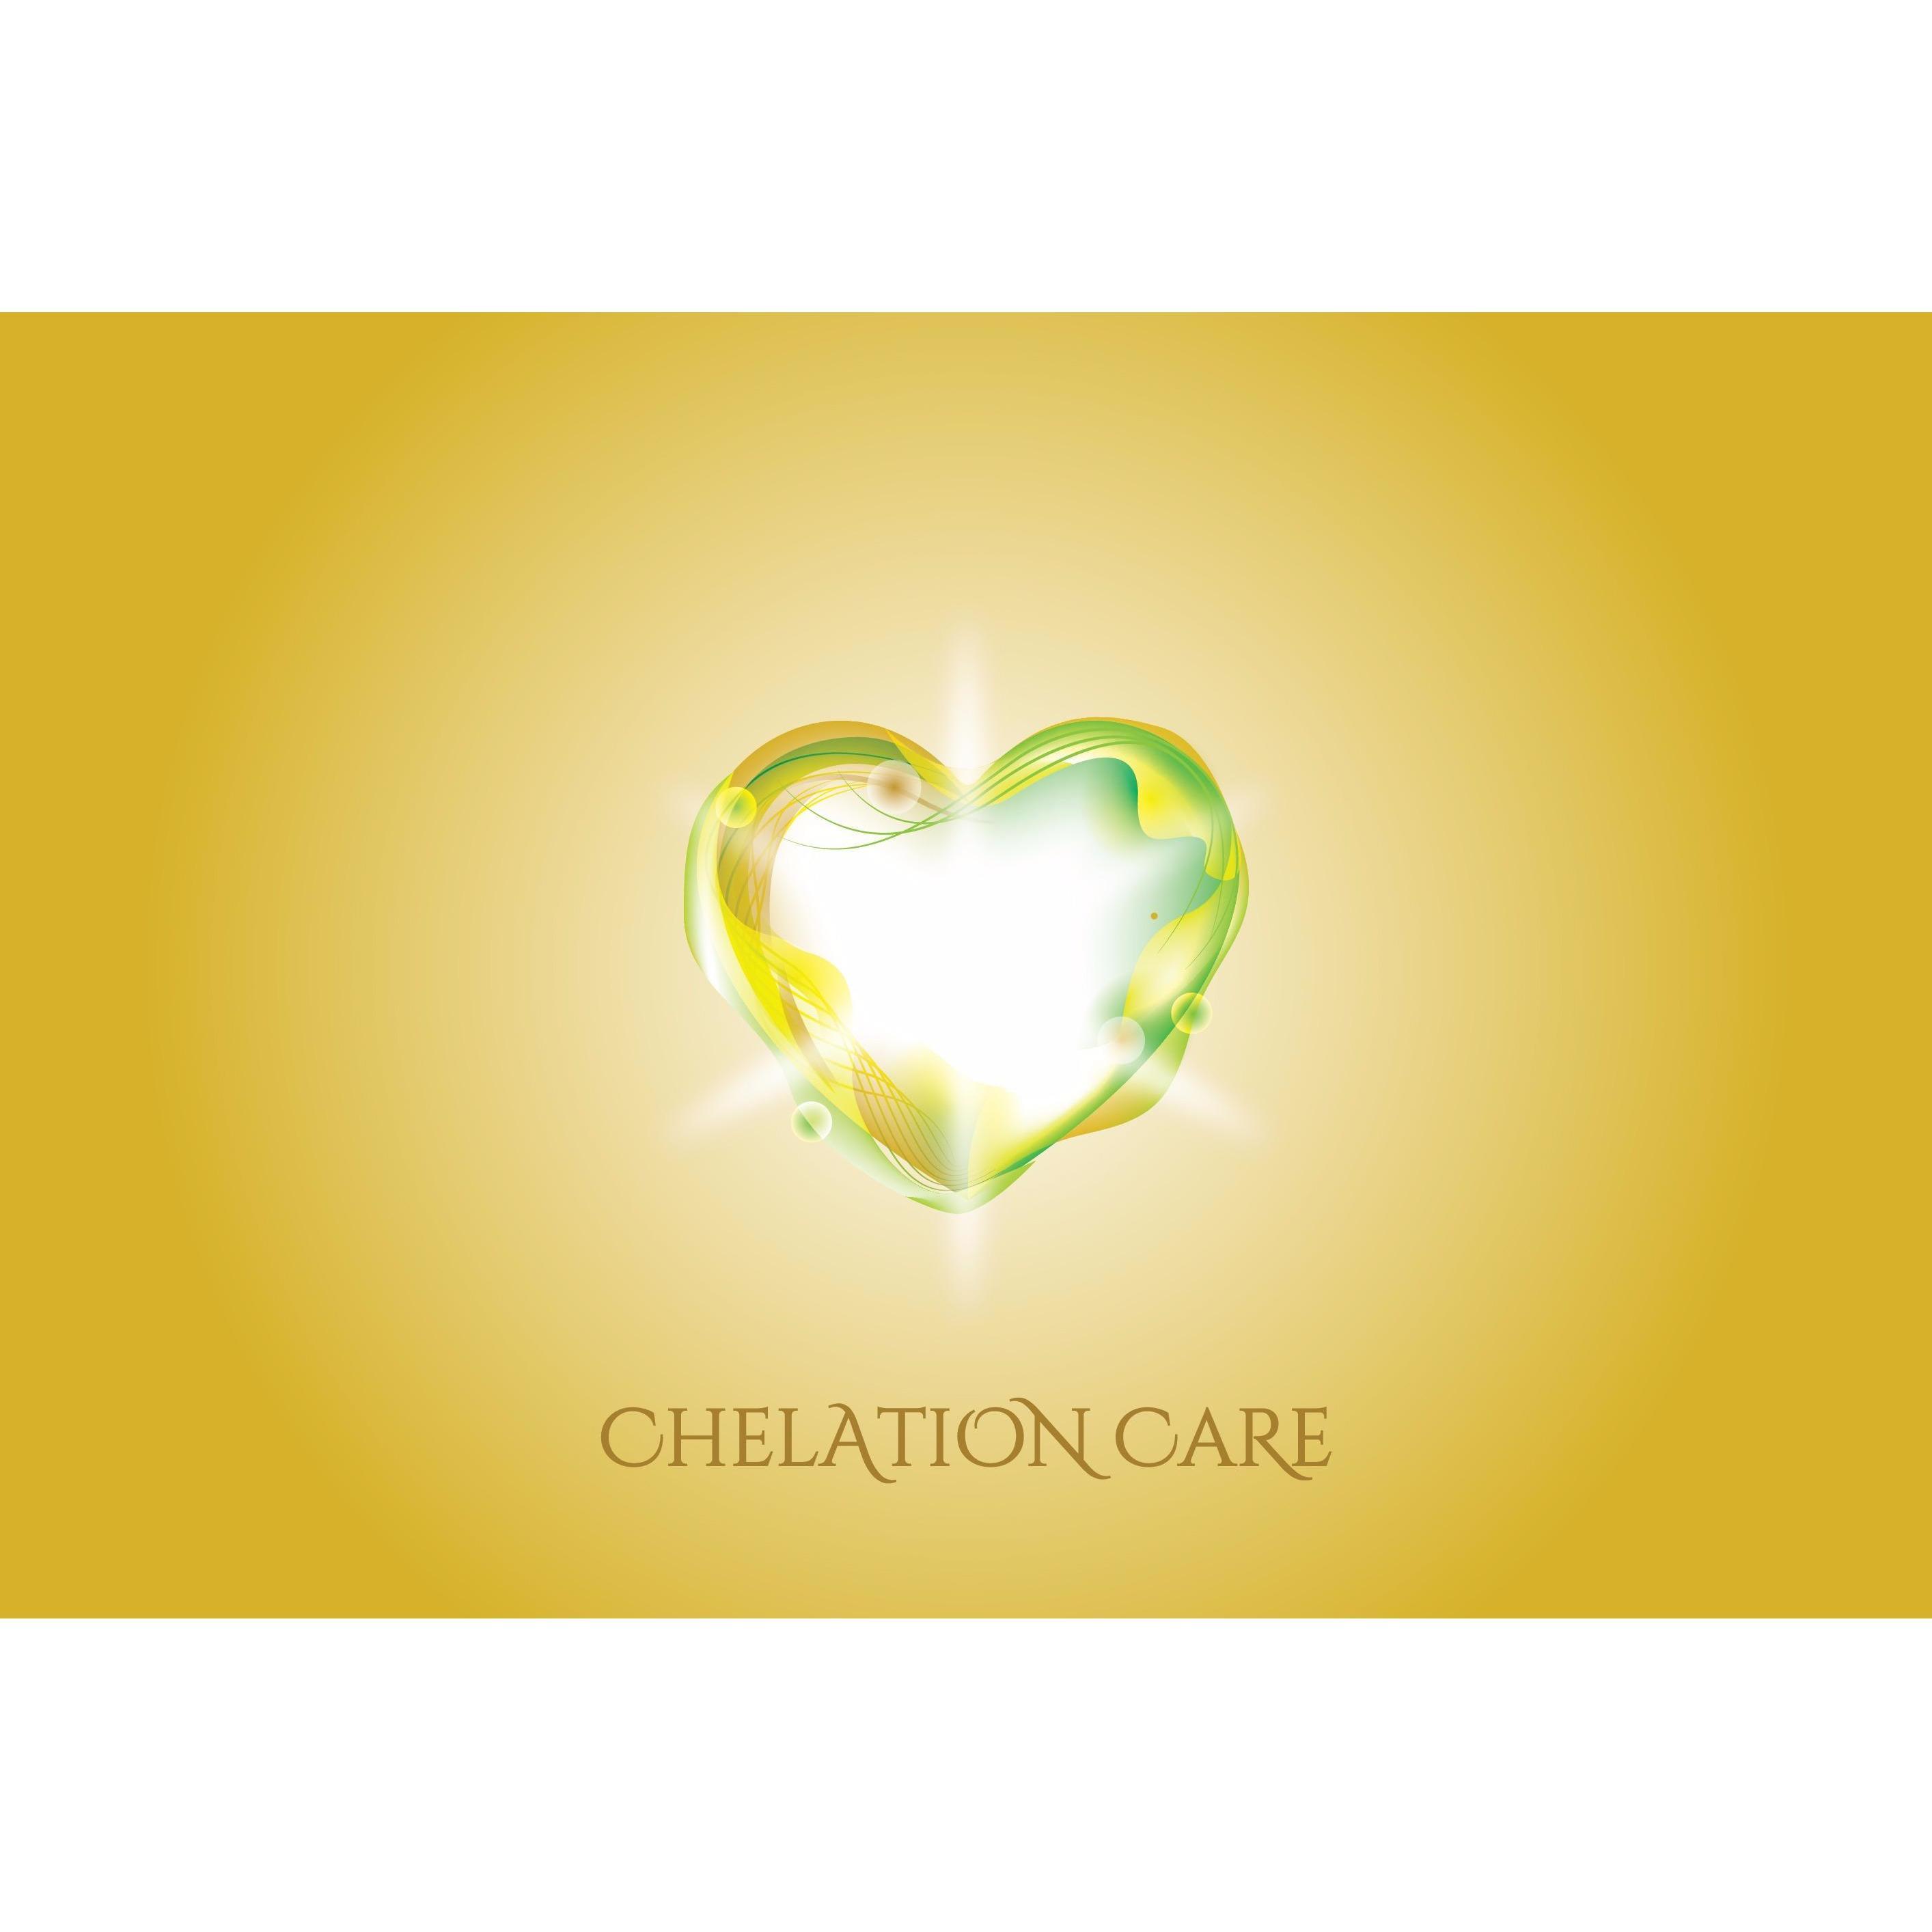 Chelationcare USA, LLC